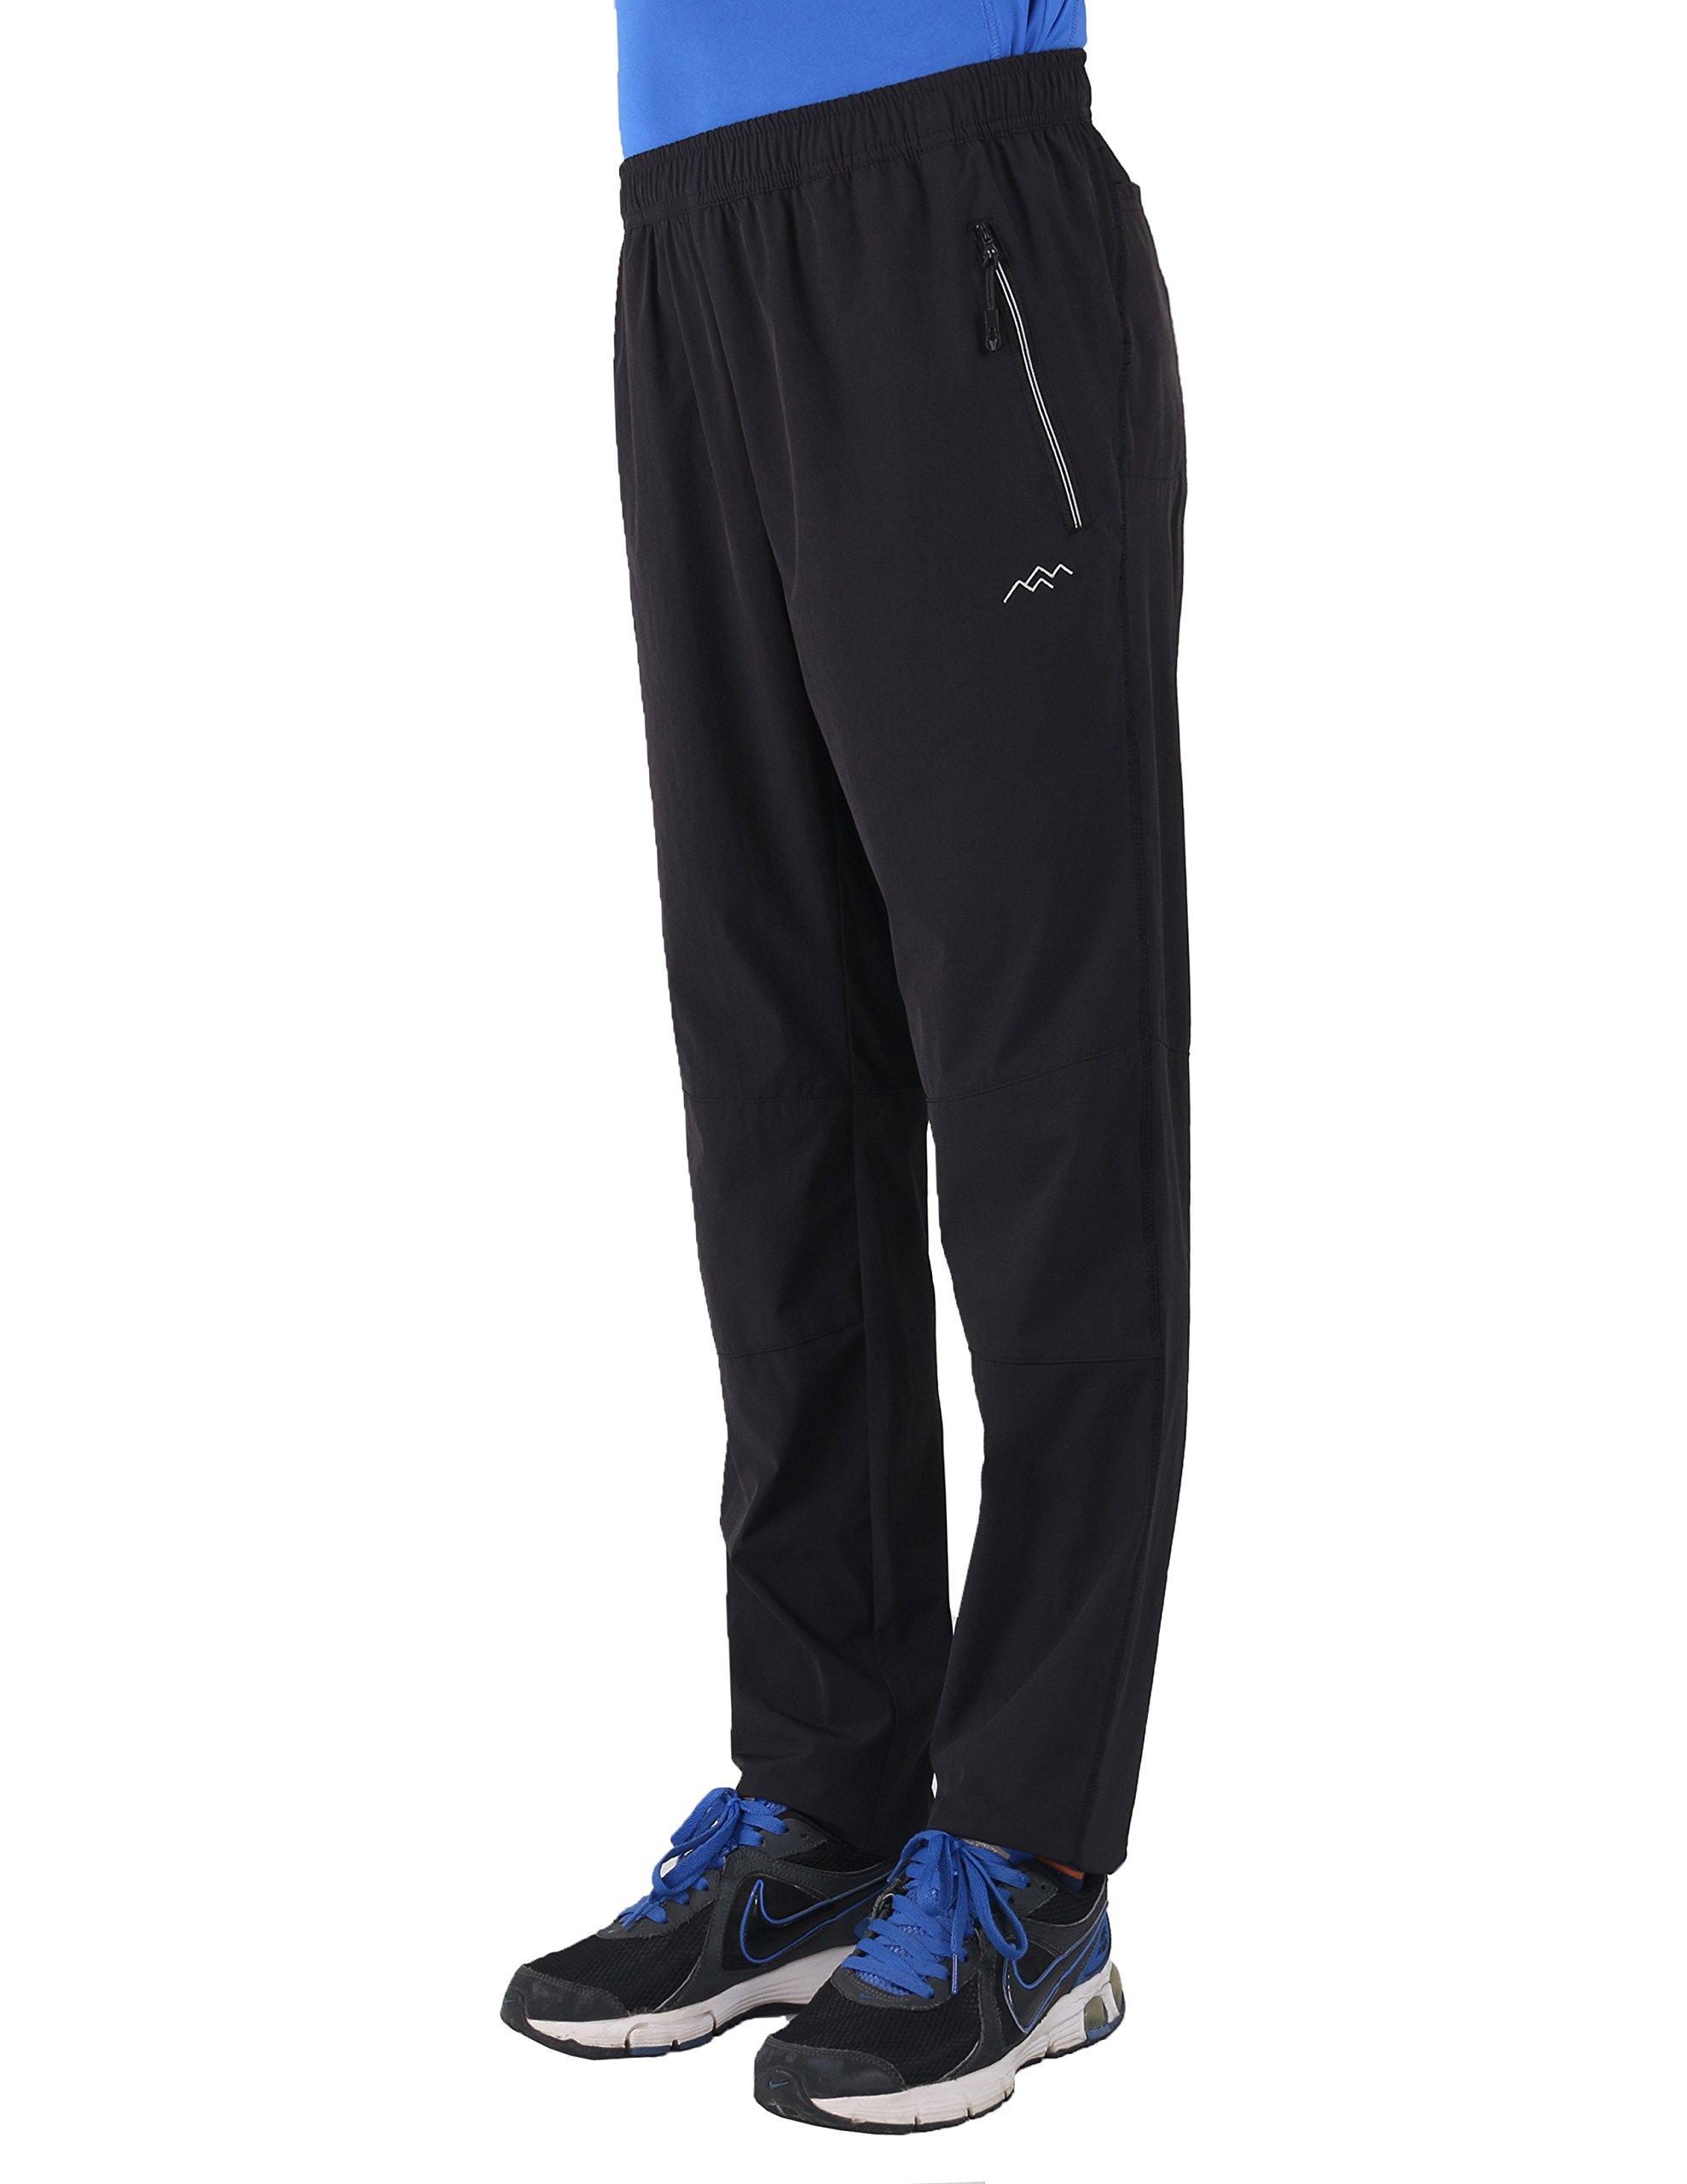 Trailside Supply Co. Men's Light Weight Quick Dry Breath Elastic-Waist Drawstring Skinny Pants,Medium-Black